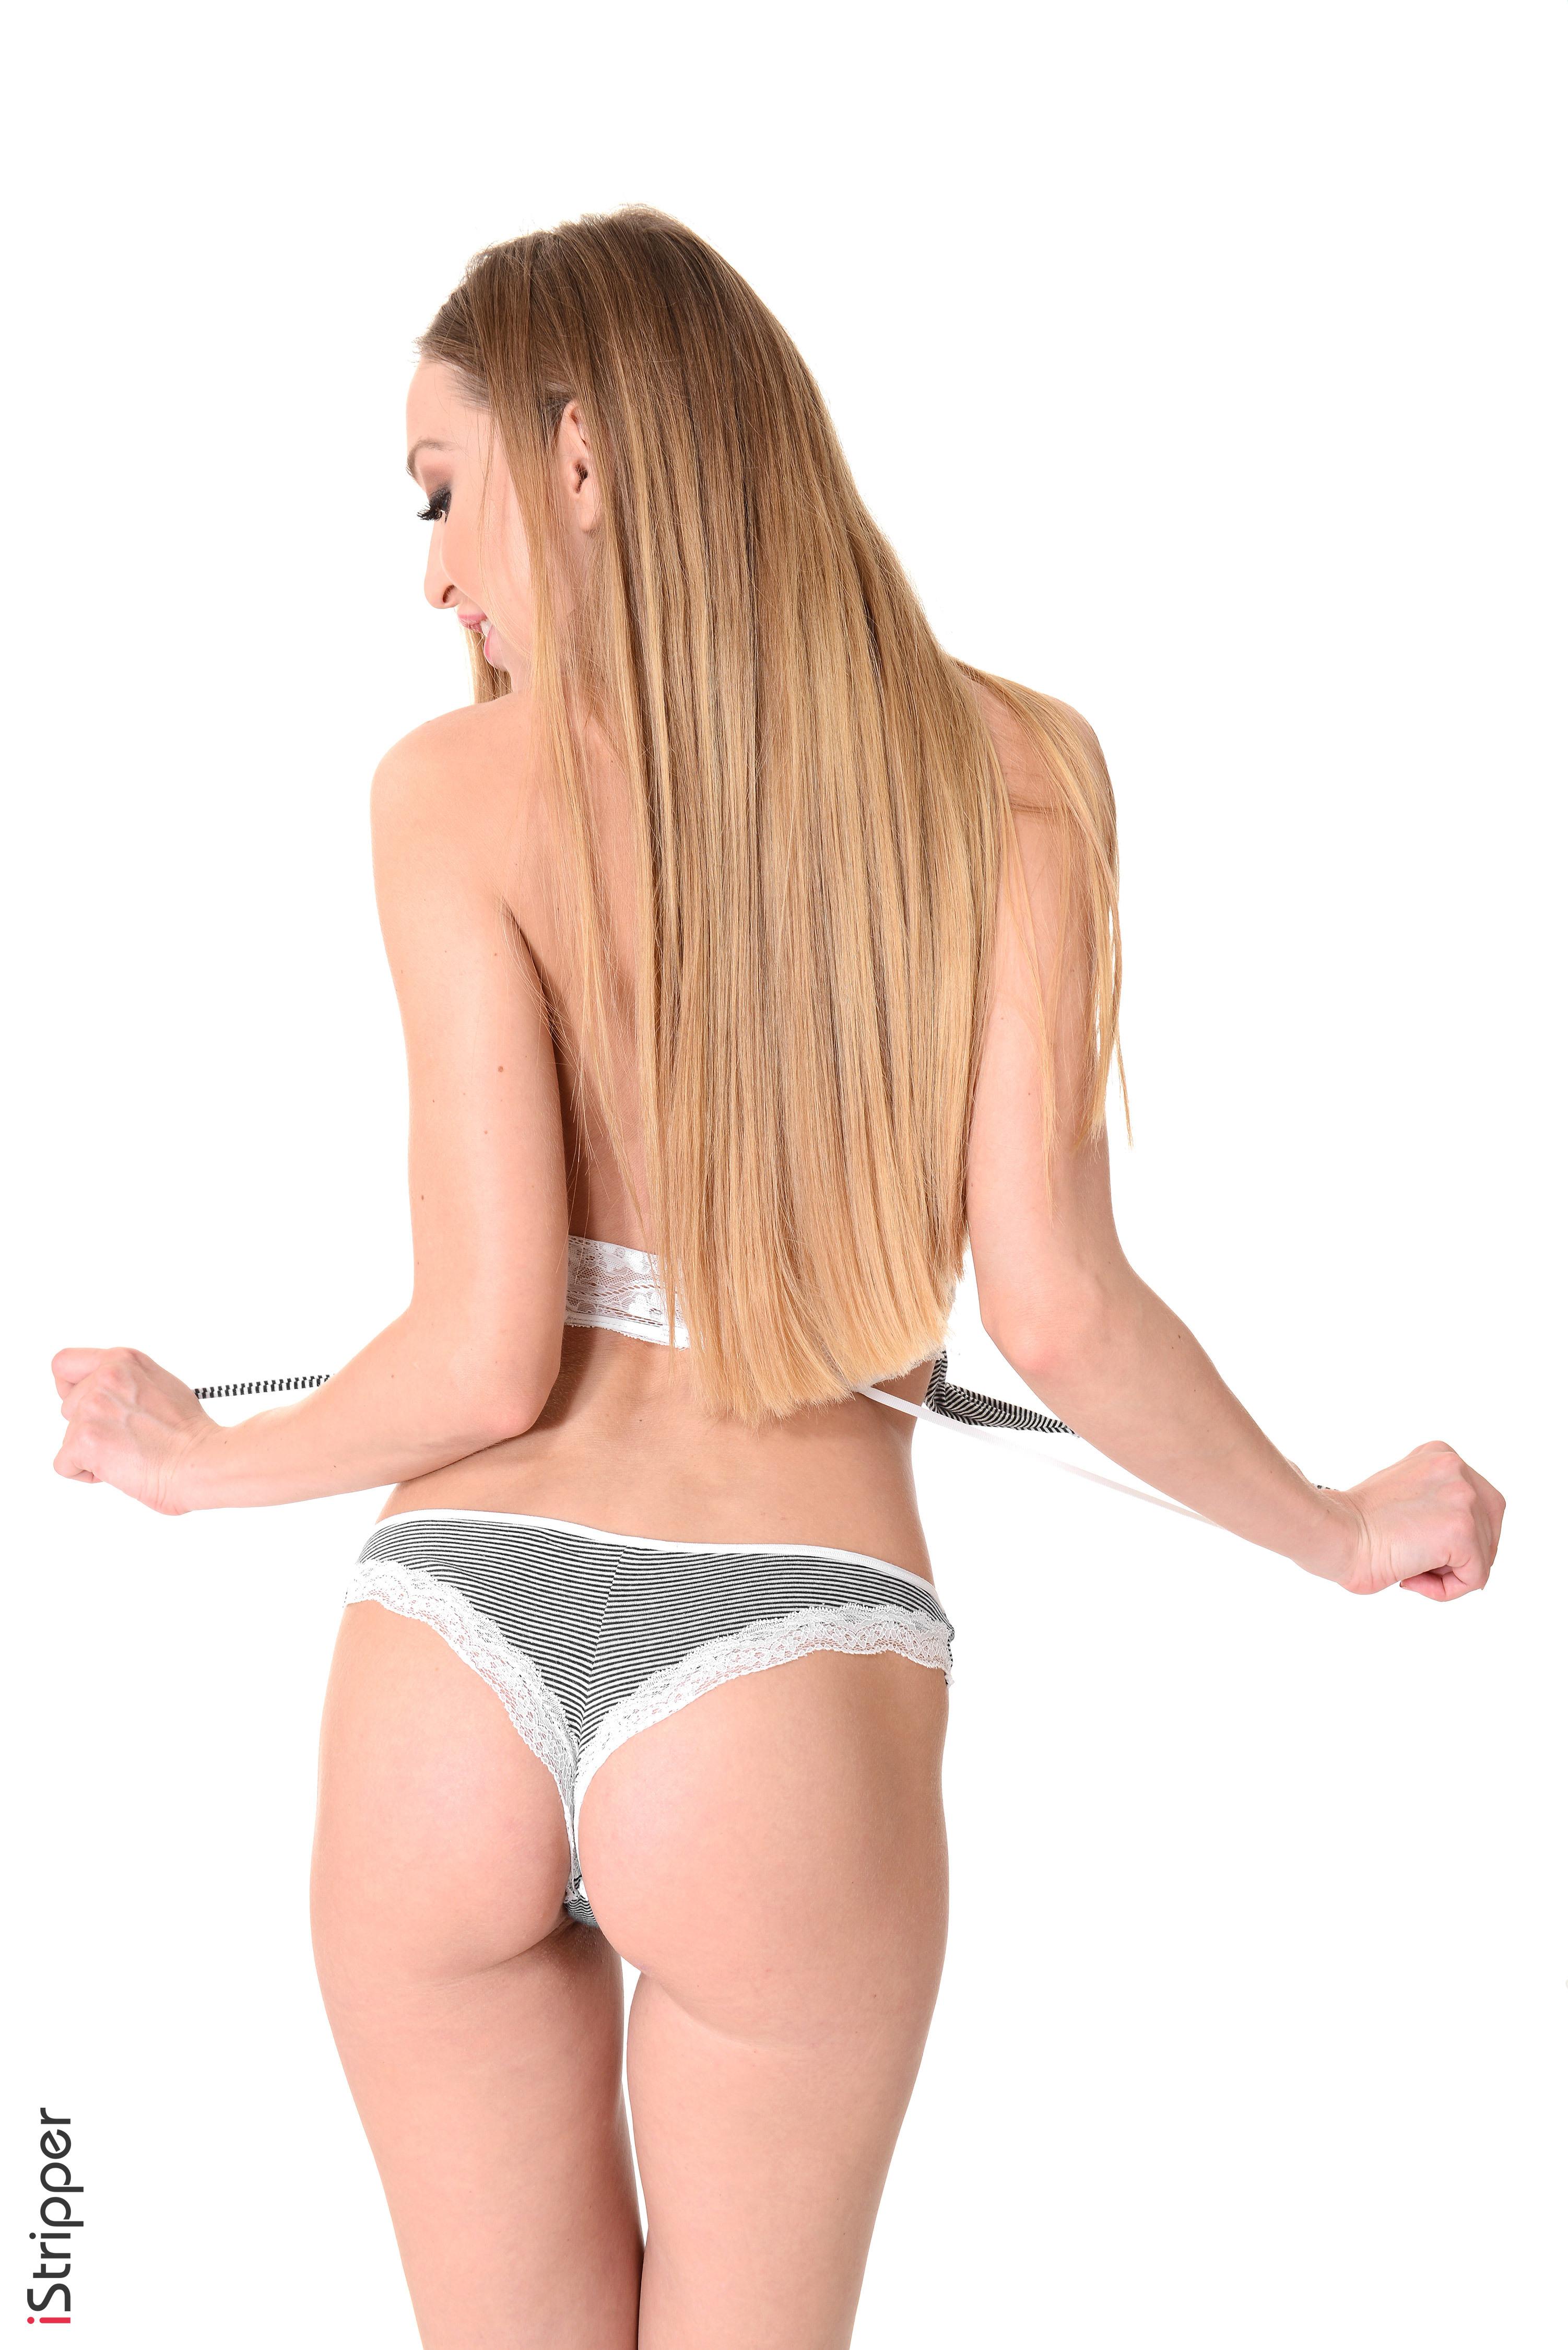 virtual strippers free samples